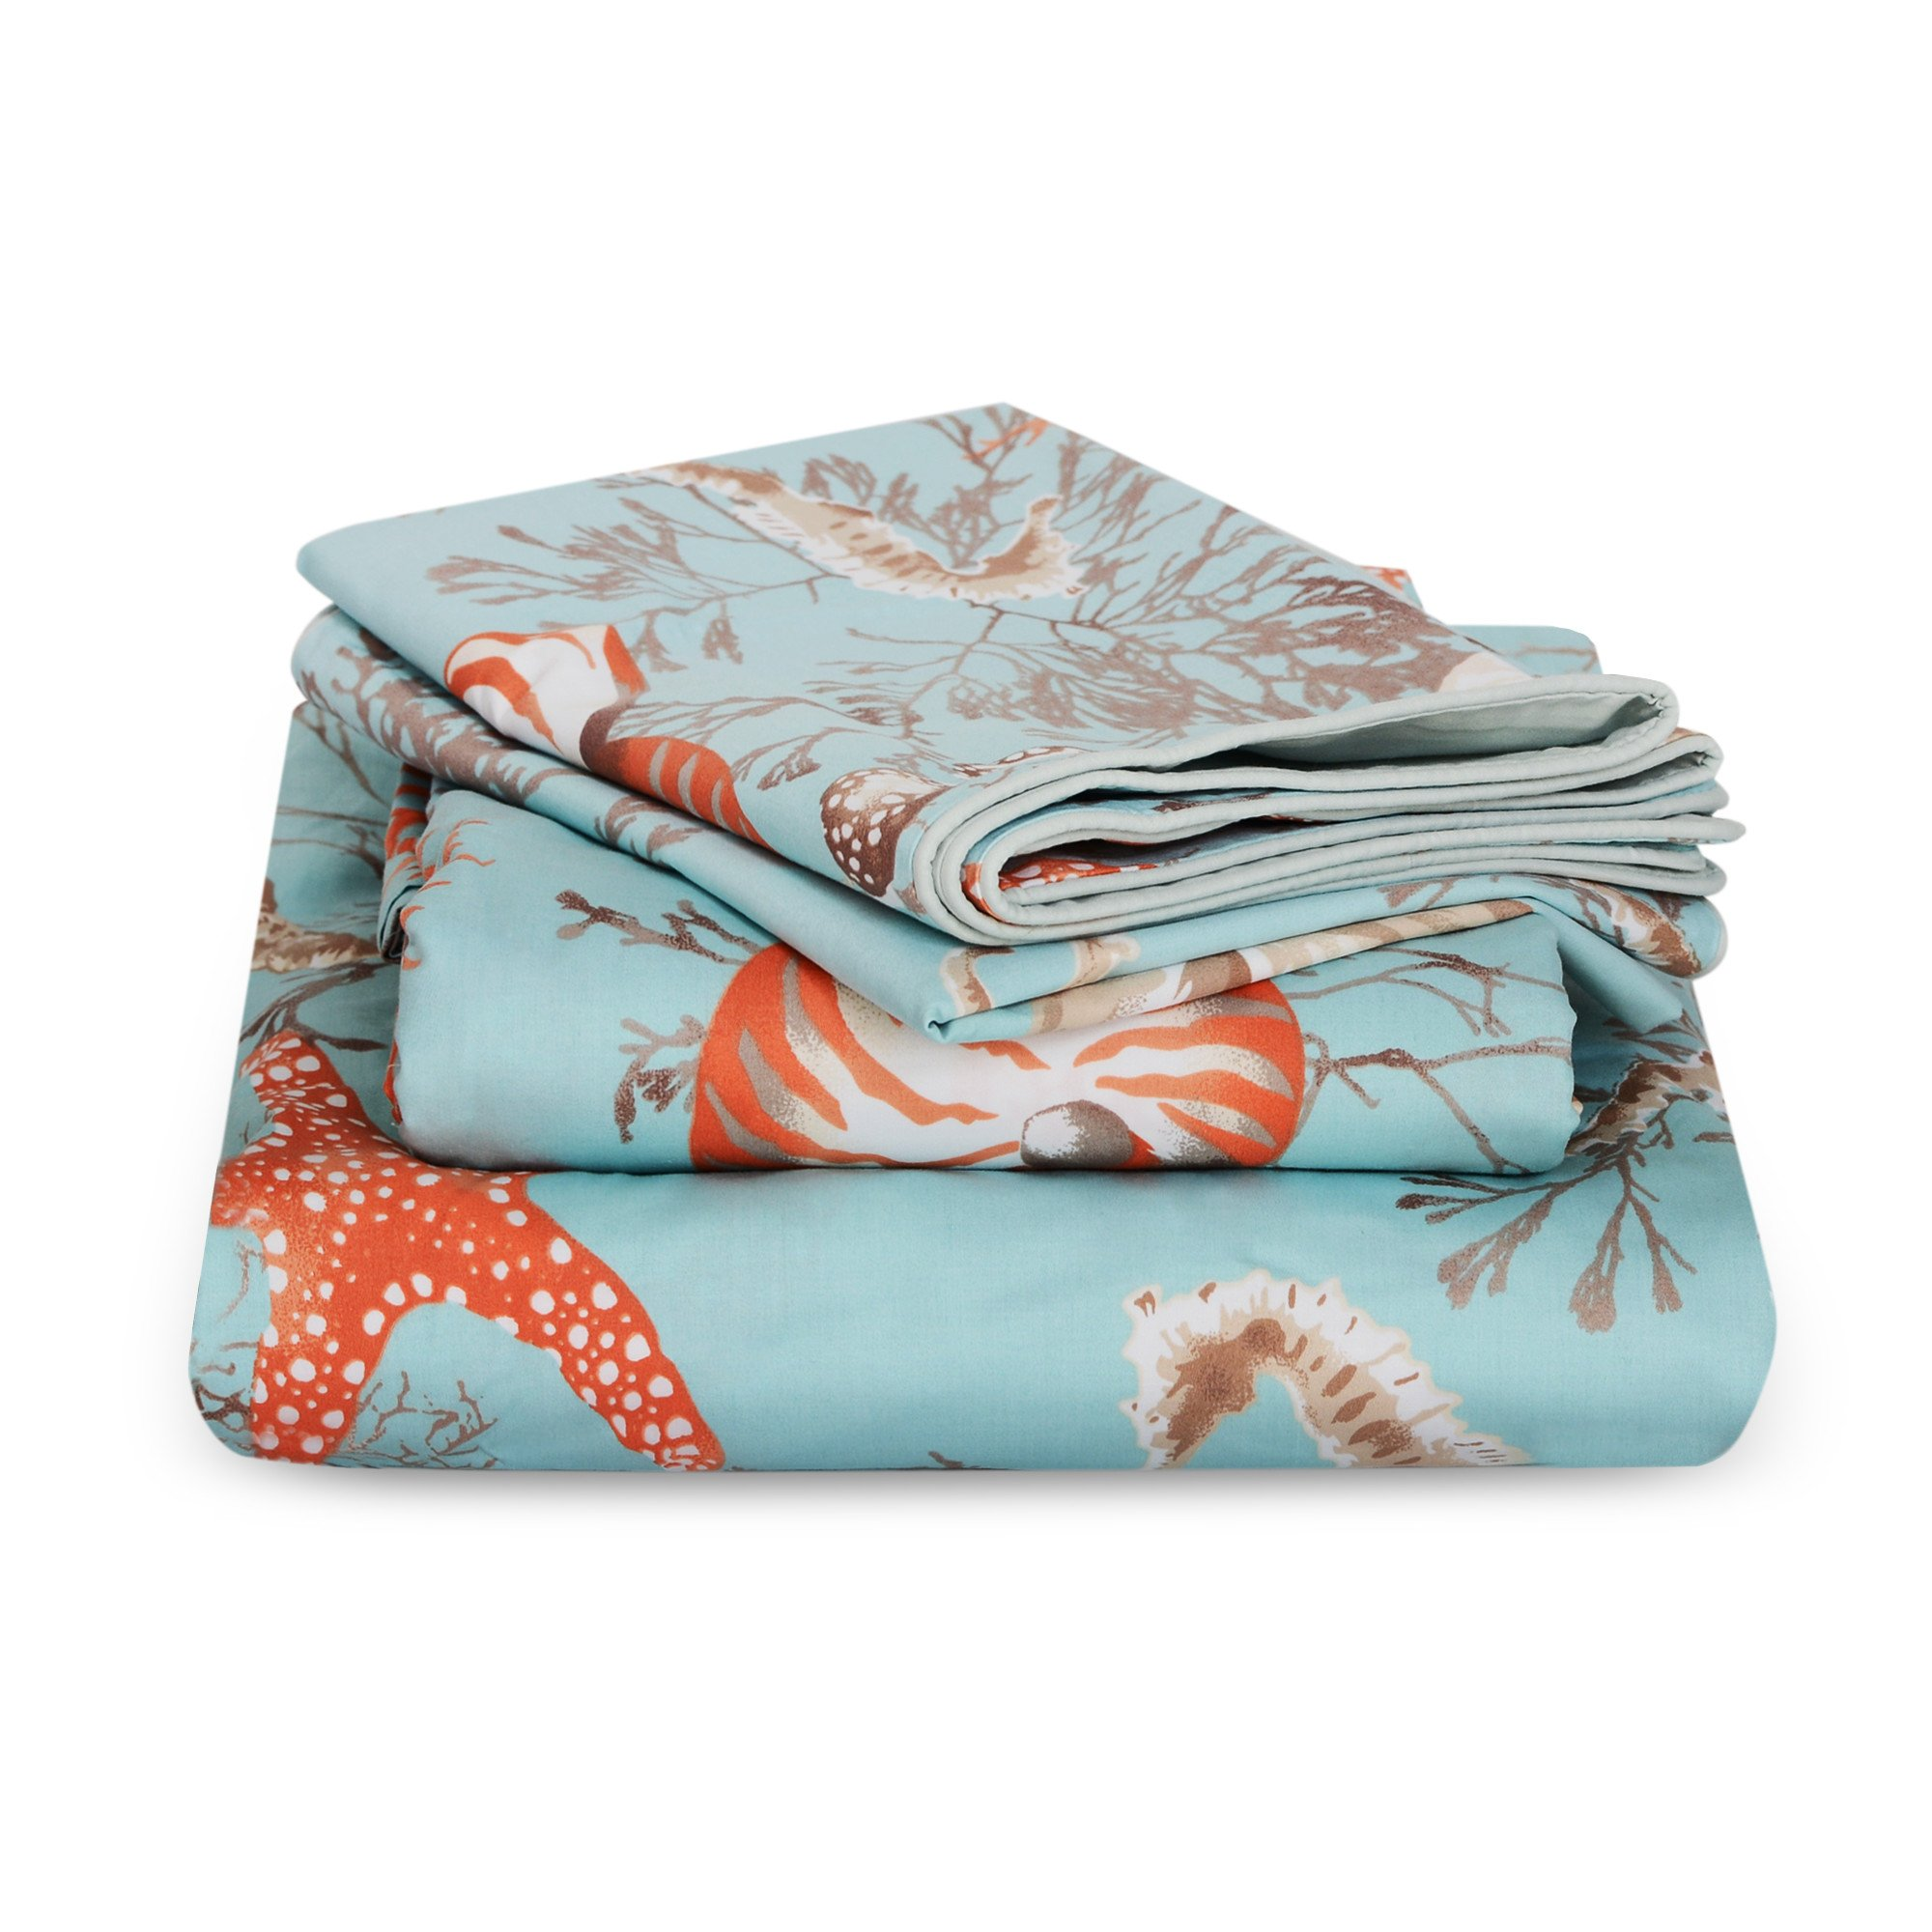 Brandream King Size Luxury Nautical Bedding Coastal Beach Themed Sheets Set 100% Cotton Bed Sheet Set Deep Pocket 4Pcs Fitted Sheet Flat Sheet Pillowcases Set 800TC